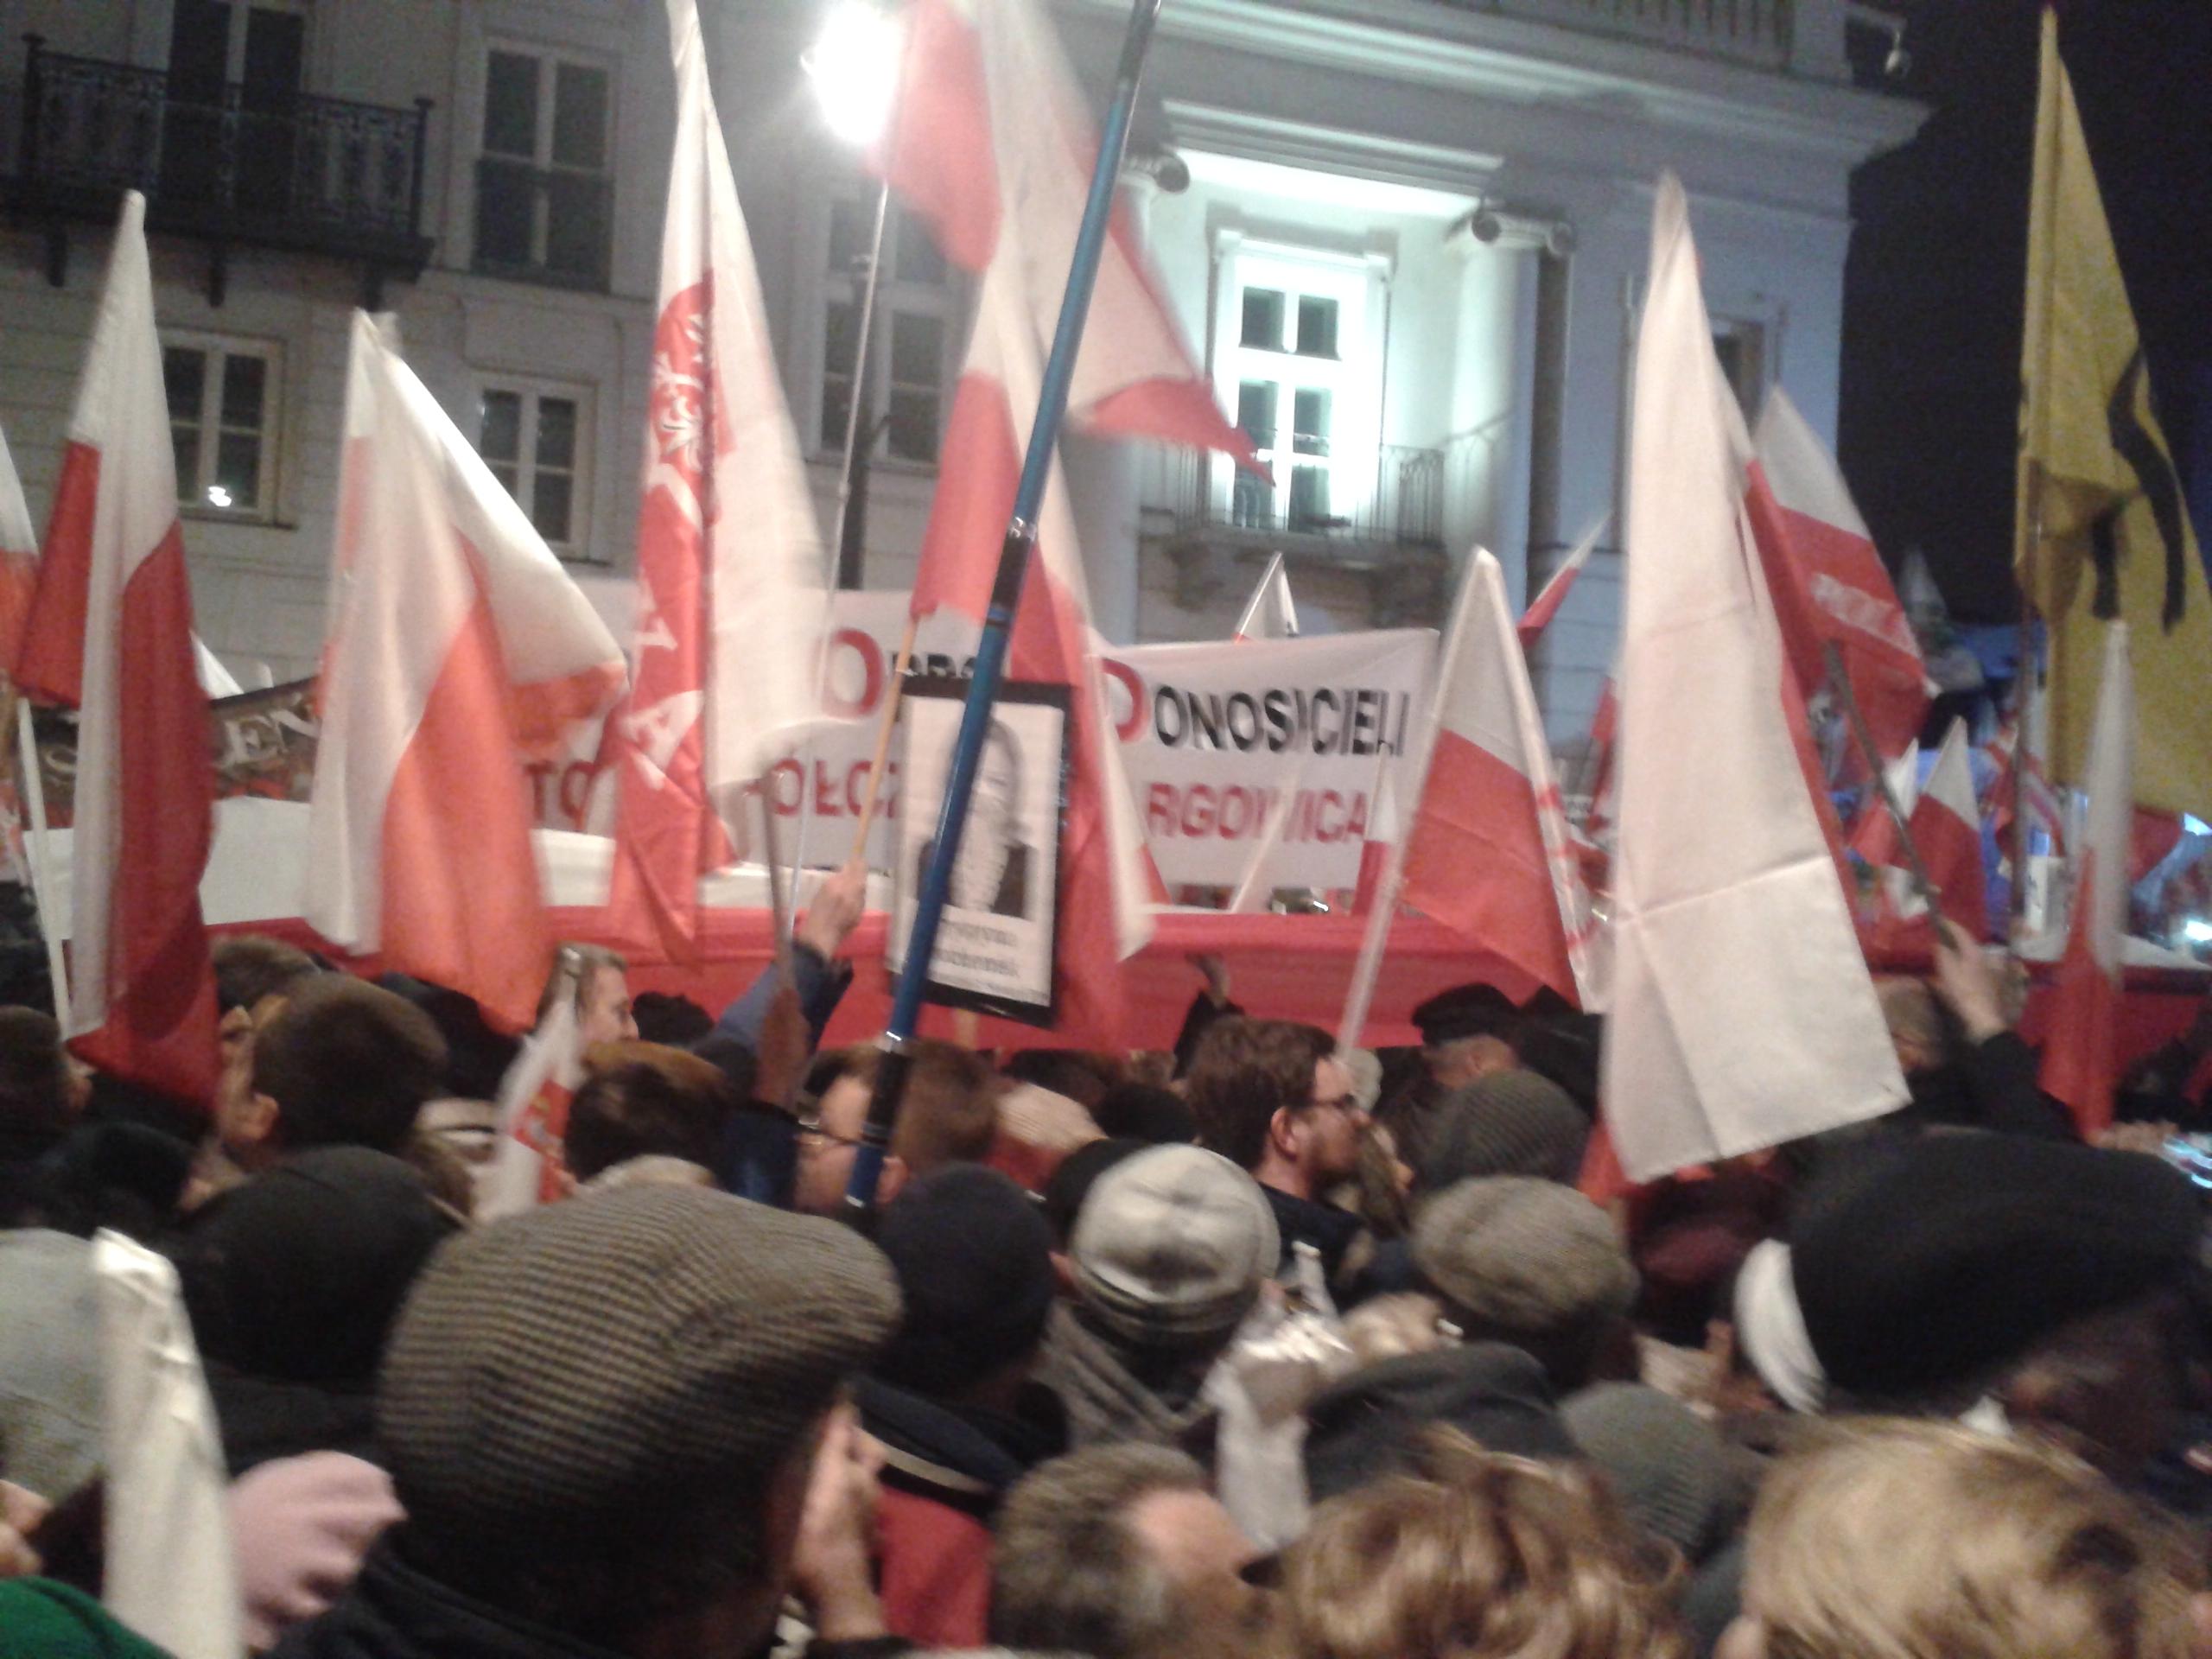 Smolensk šest let poté